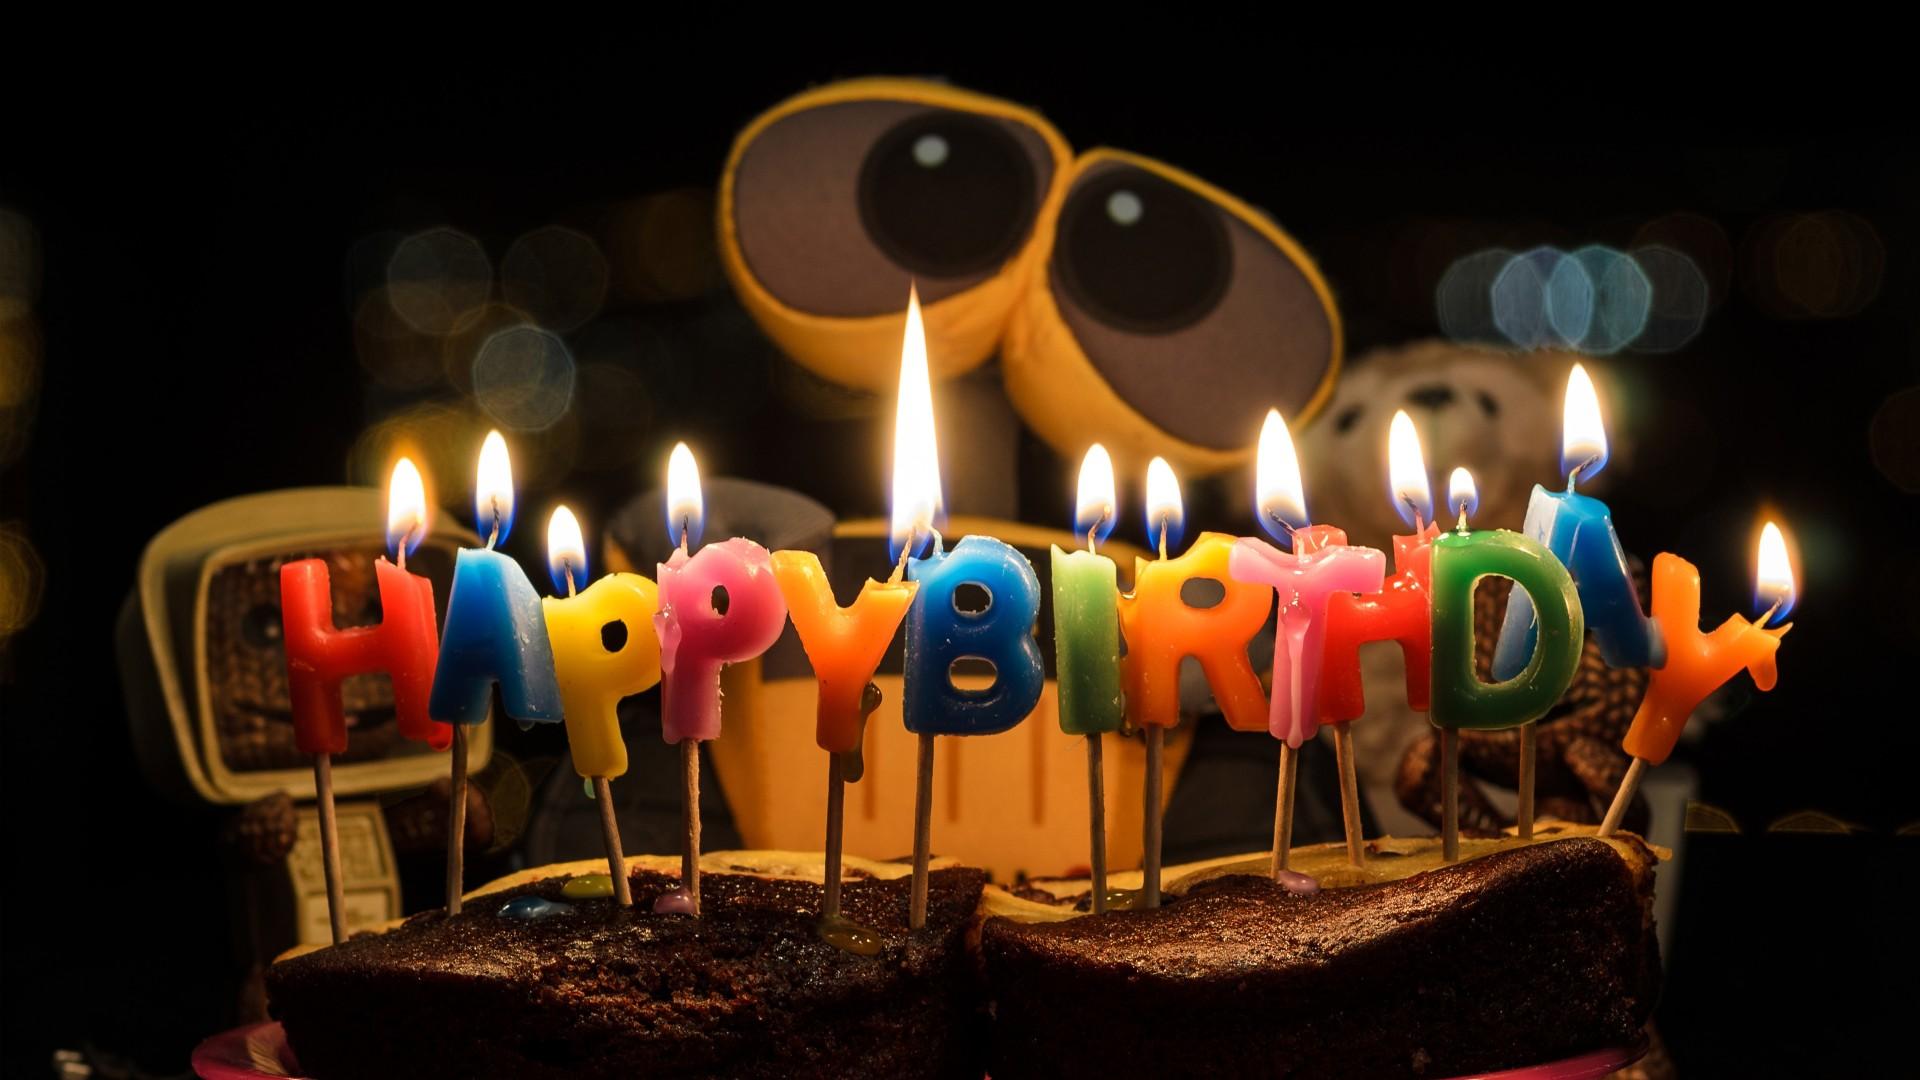 Cute Cake Hd Wallpaper Wall E Happy Birthday 4k Wallpapers Hd Wallpapers Id